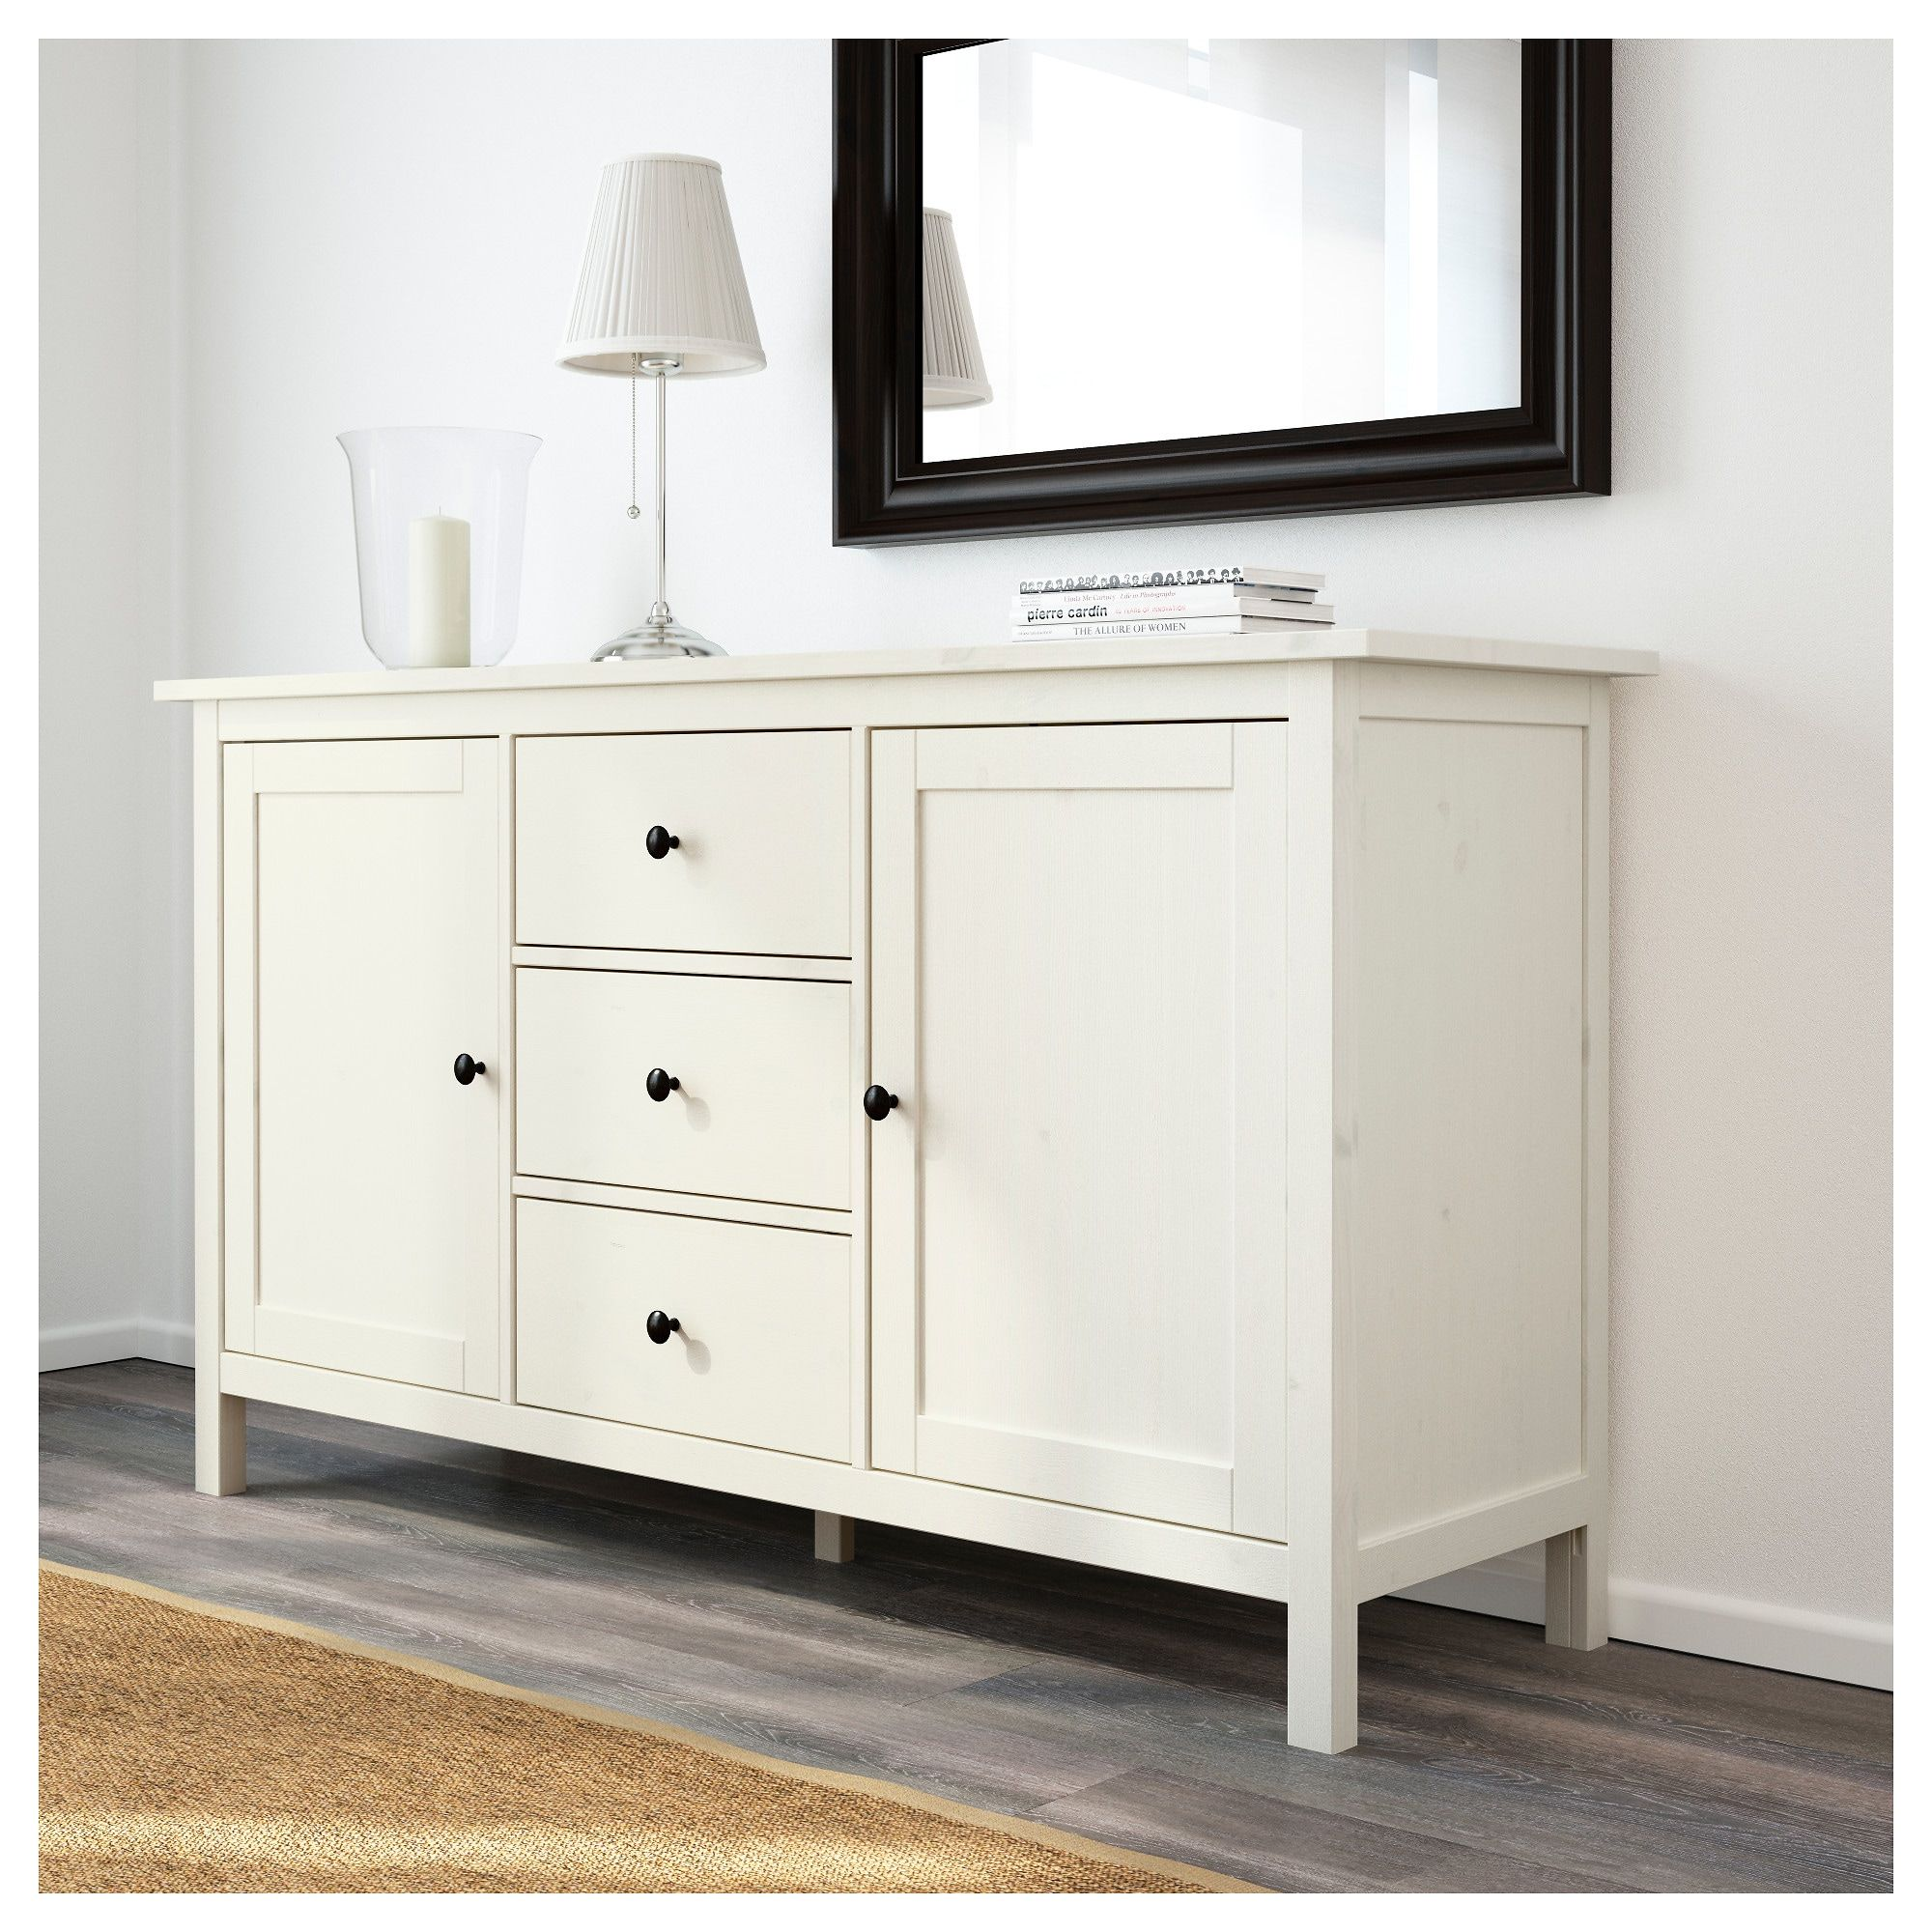 Hemnes Sideboard White Stain 61 3 4x34 5 8 White Sideboard